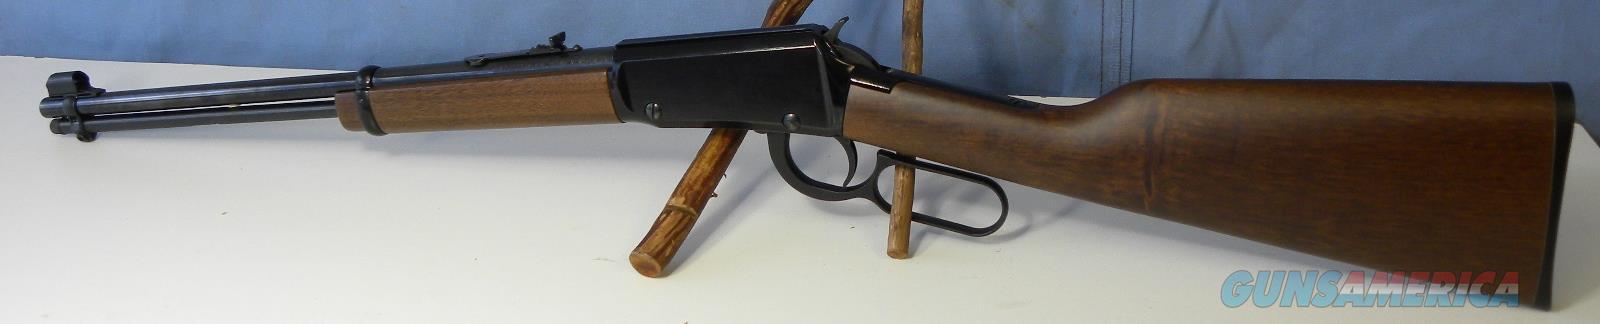 Henry .22 Standard H001  Guns > Rifles > Henry Rifle Company